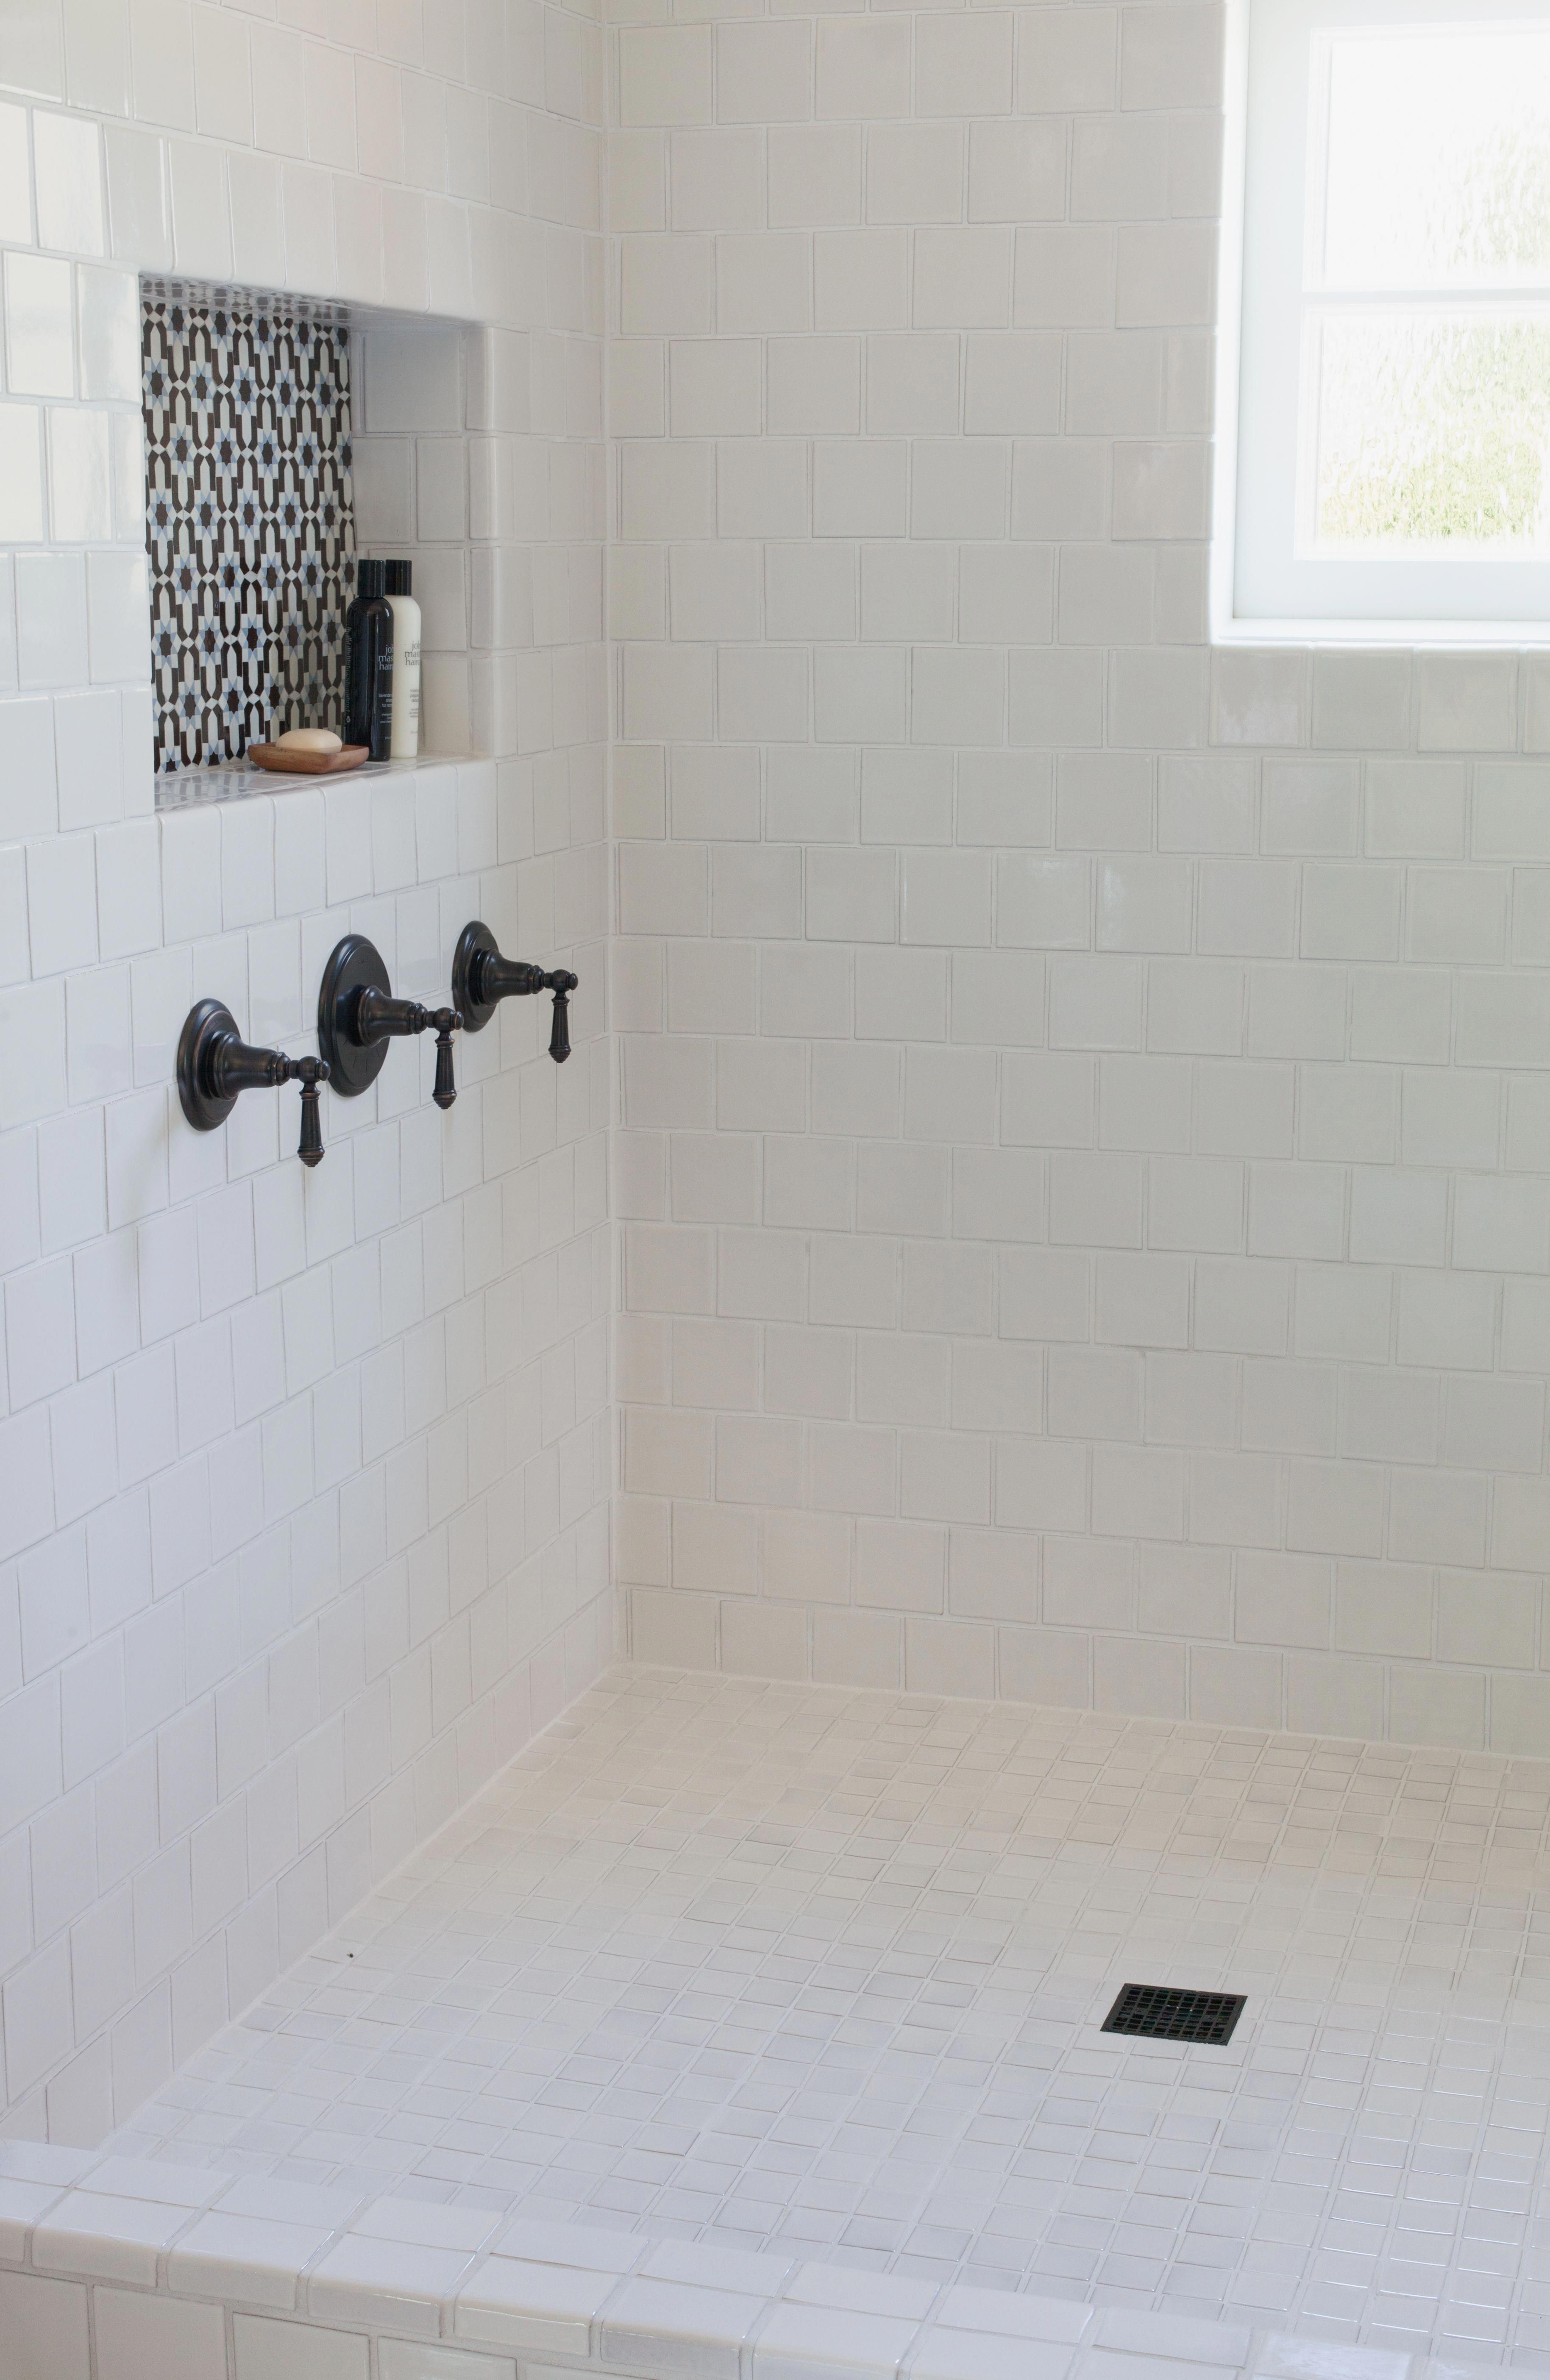 4 Square On Walls 2 Square On Floor 5 Tile Trends For 2016 Fireclay Tile Bathroommakeover Shower Shelves Bathroom Flooring Bathroom Inspiration